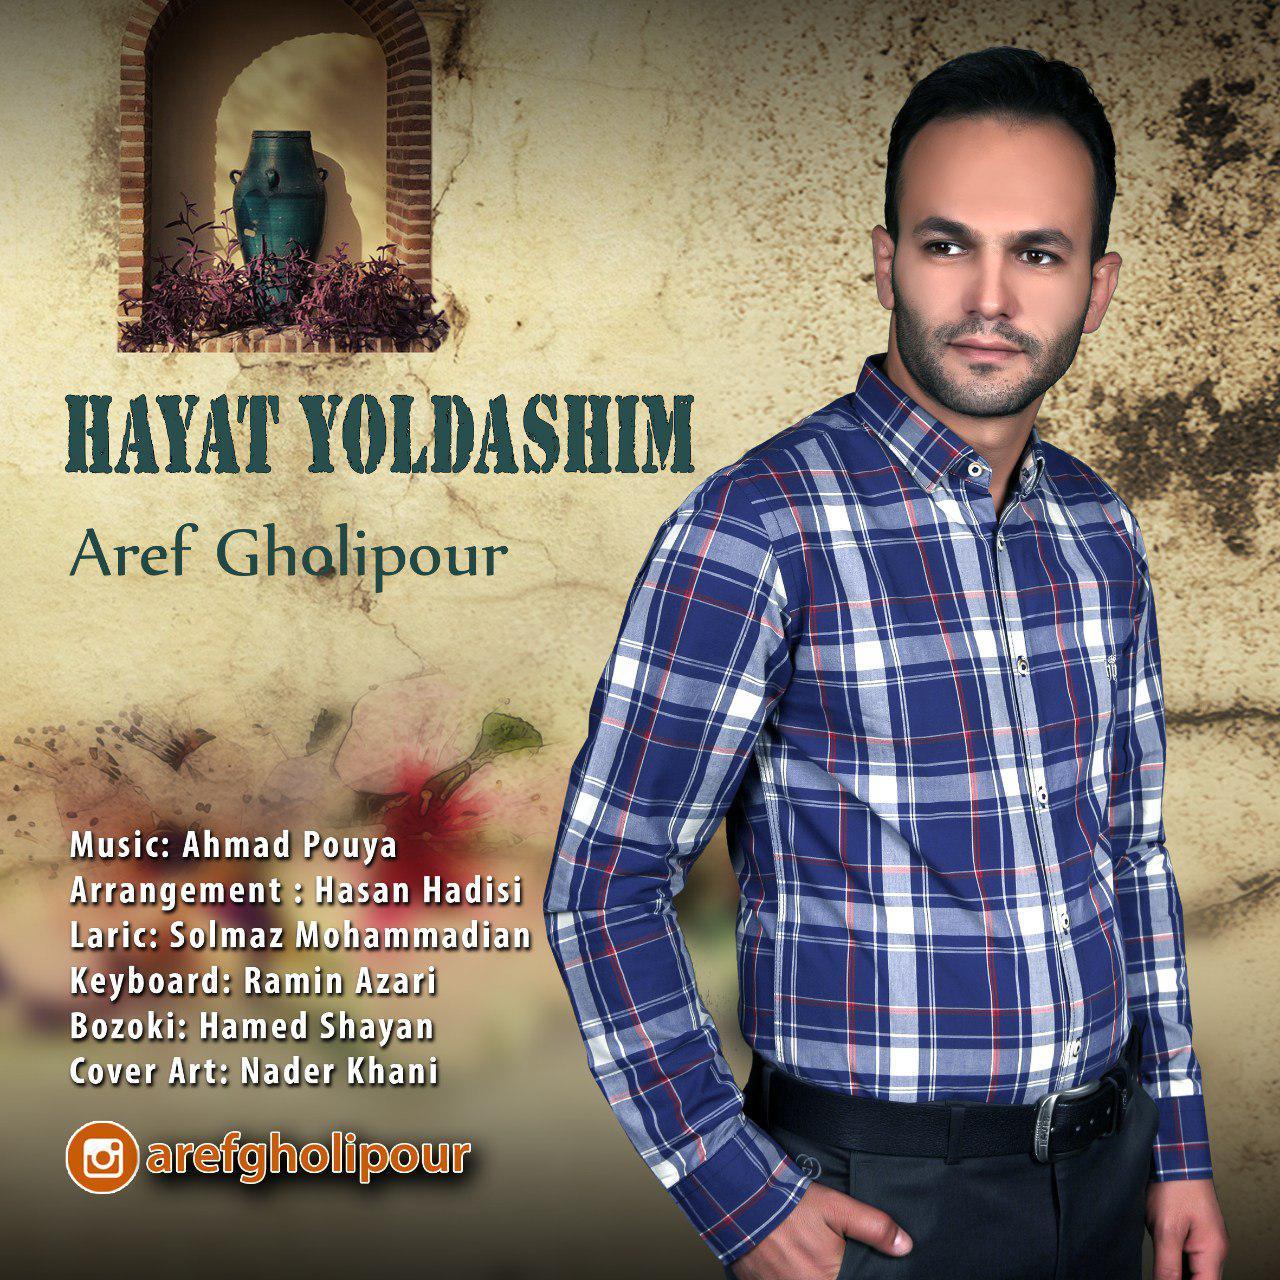 http://s7.picofile.com/file/8380208776/04Aref_Gholipour_Hayat_Yoldasim.jpg